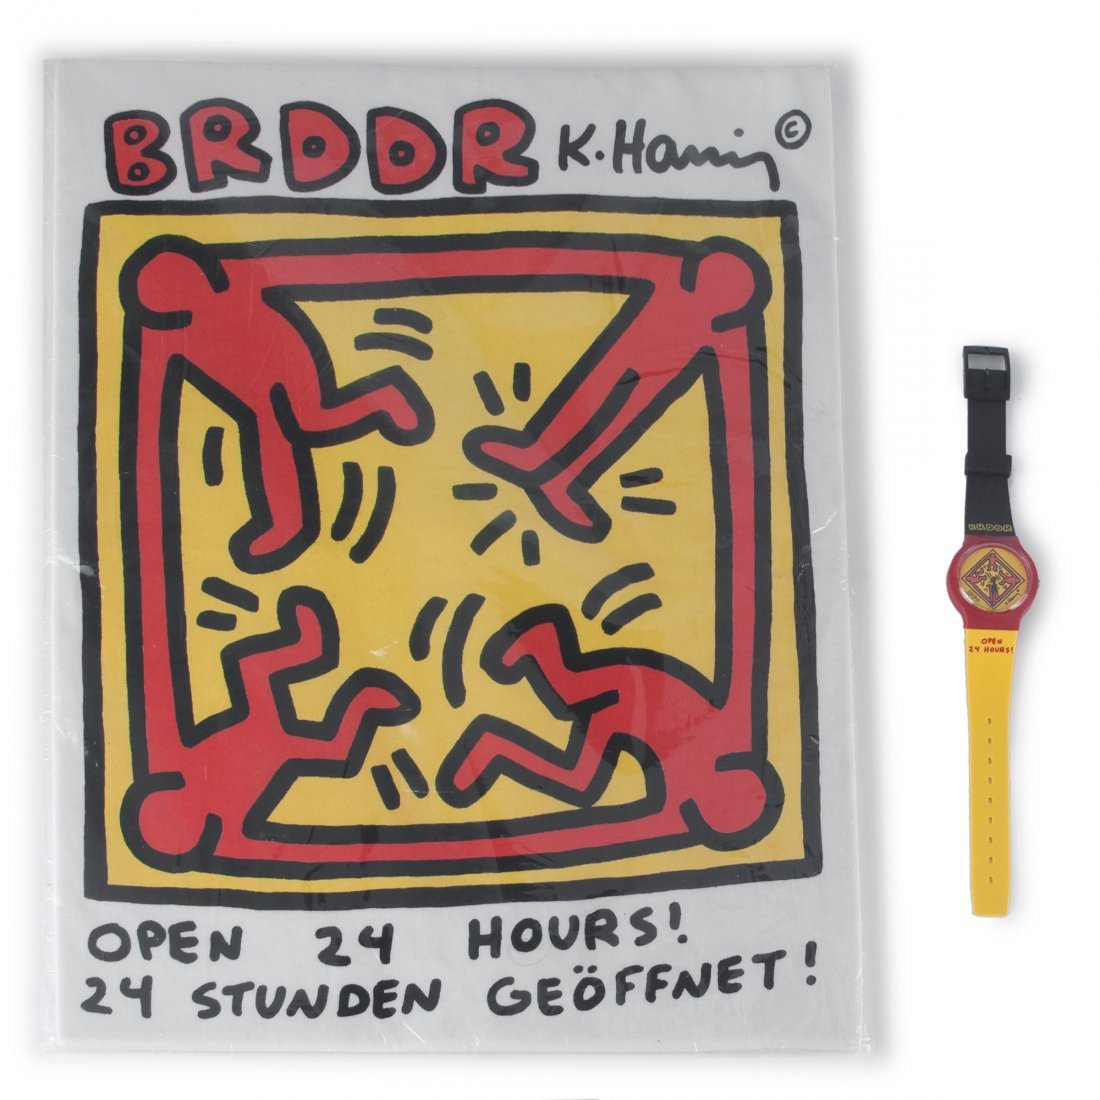 'BRDDR' watch and T shirt, 1990